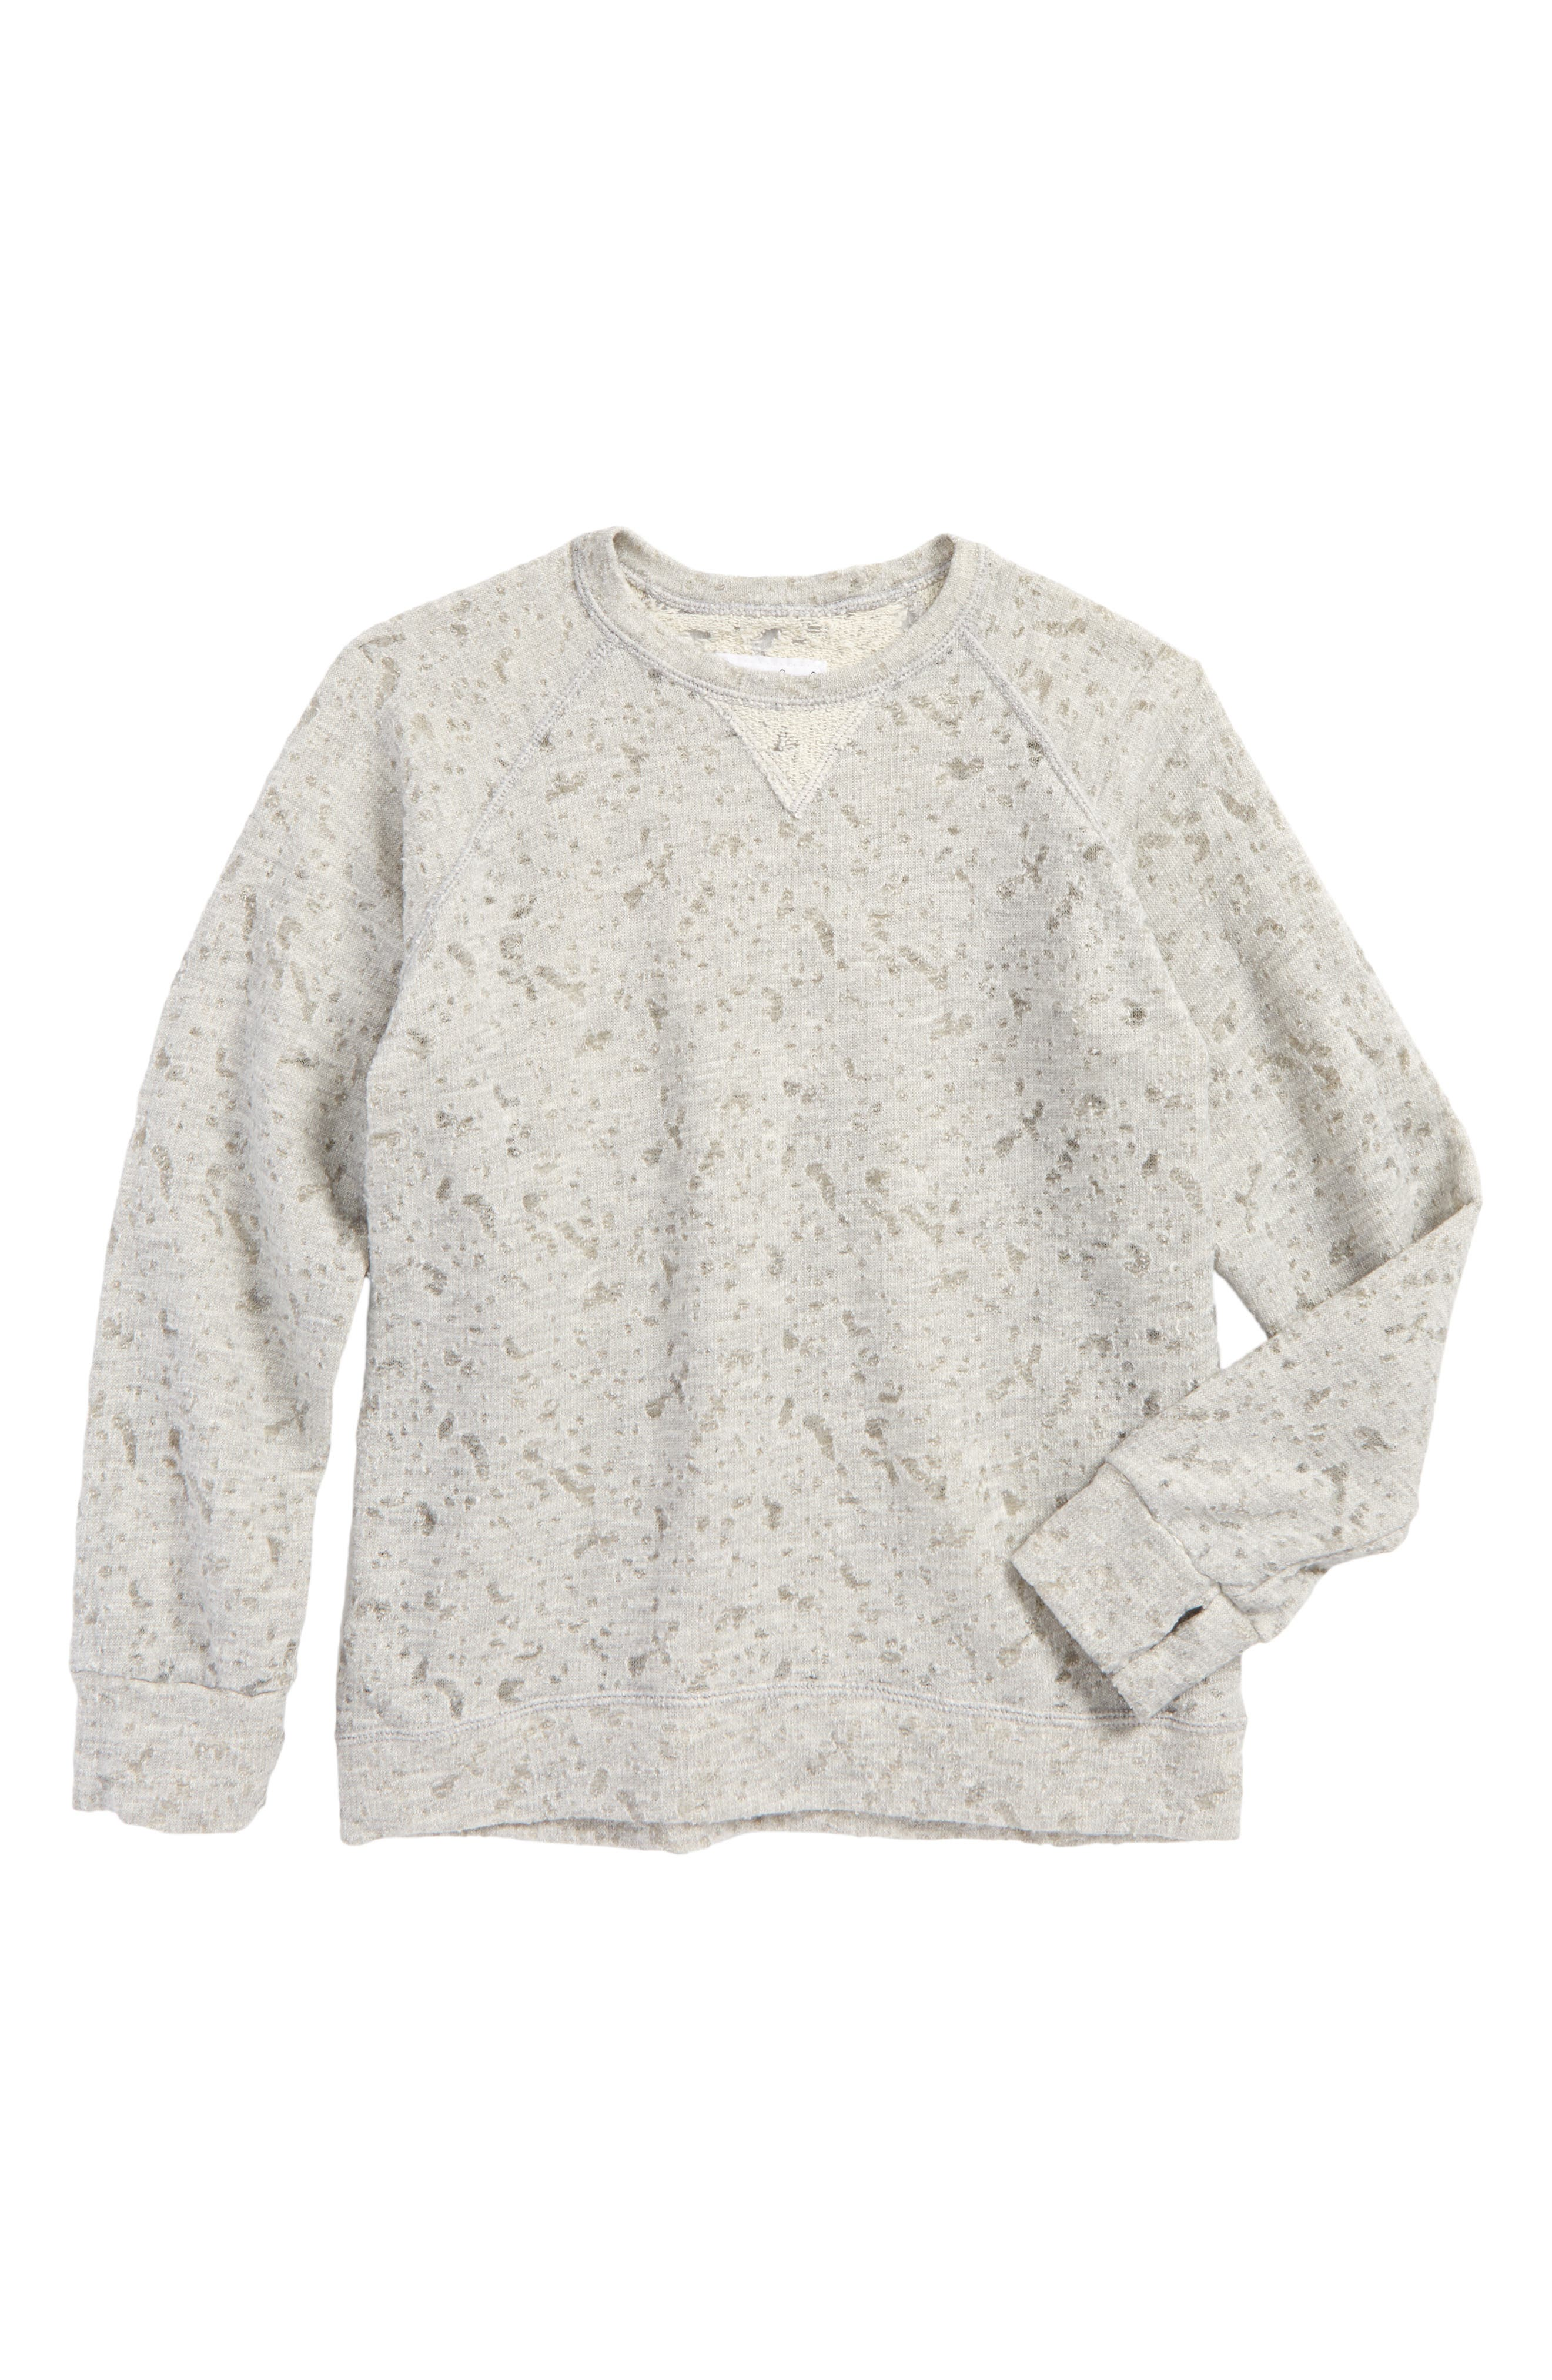 Alternate Image 1 Selected - NUNUNU Deconstructed Sweatshirt (Toddler Boys & Little Boys)